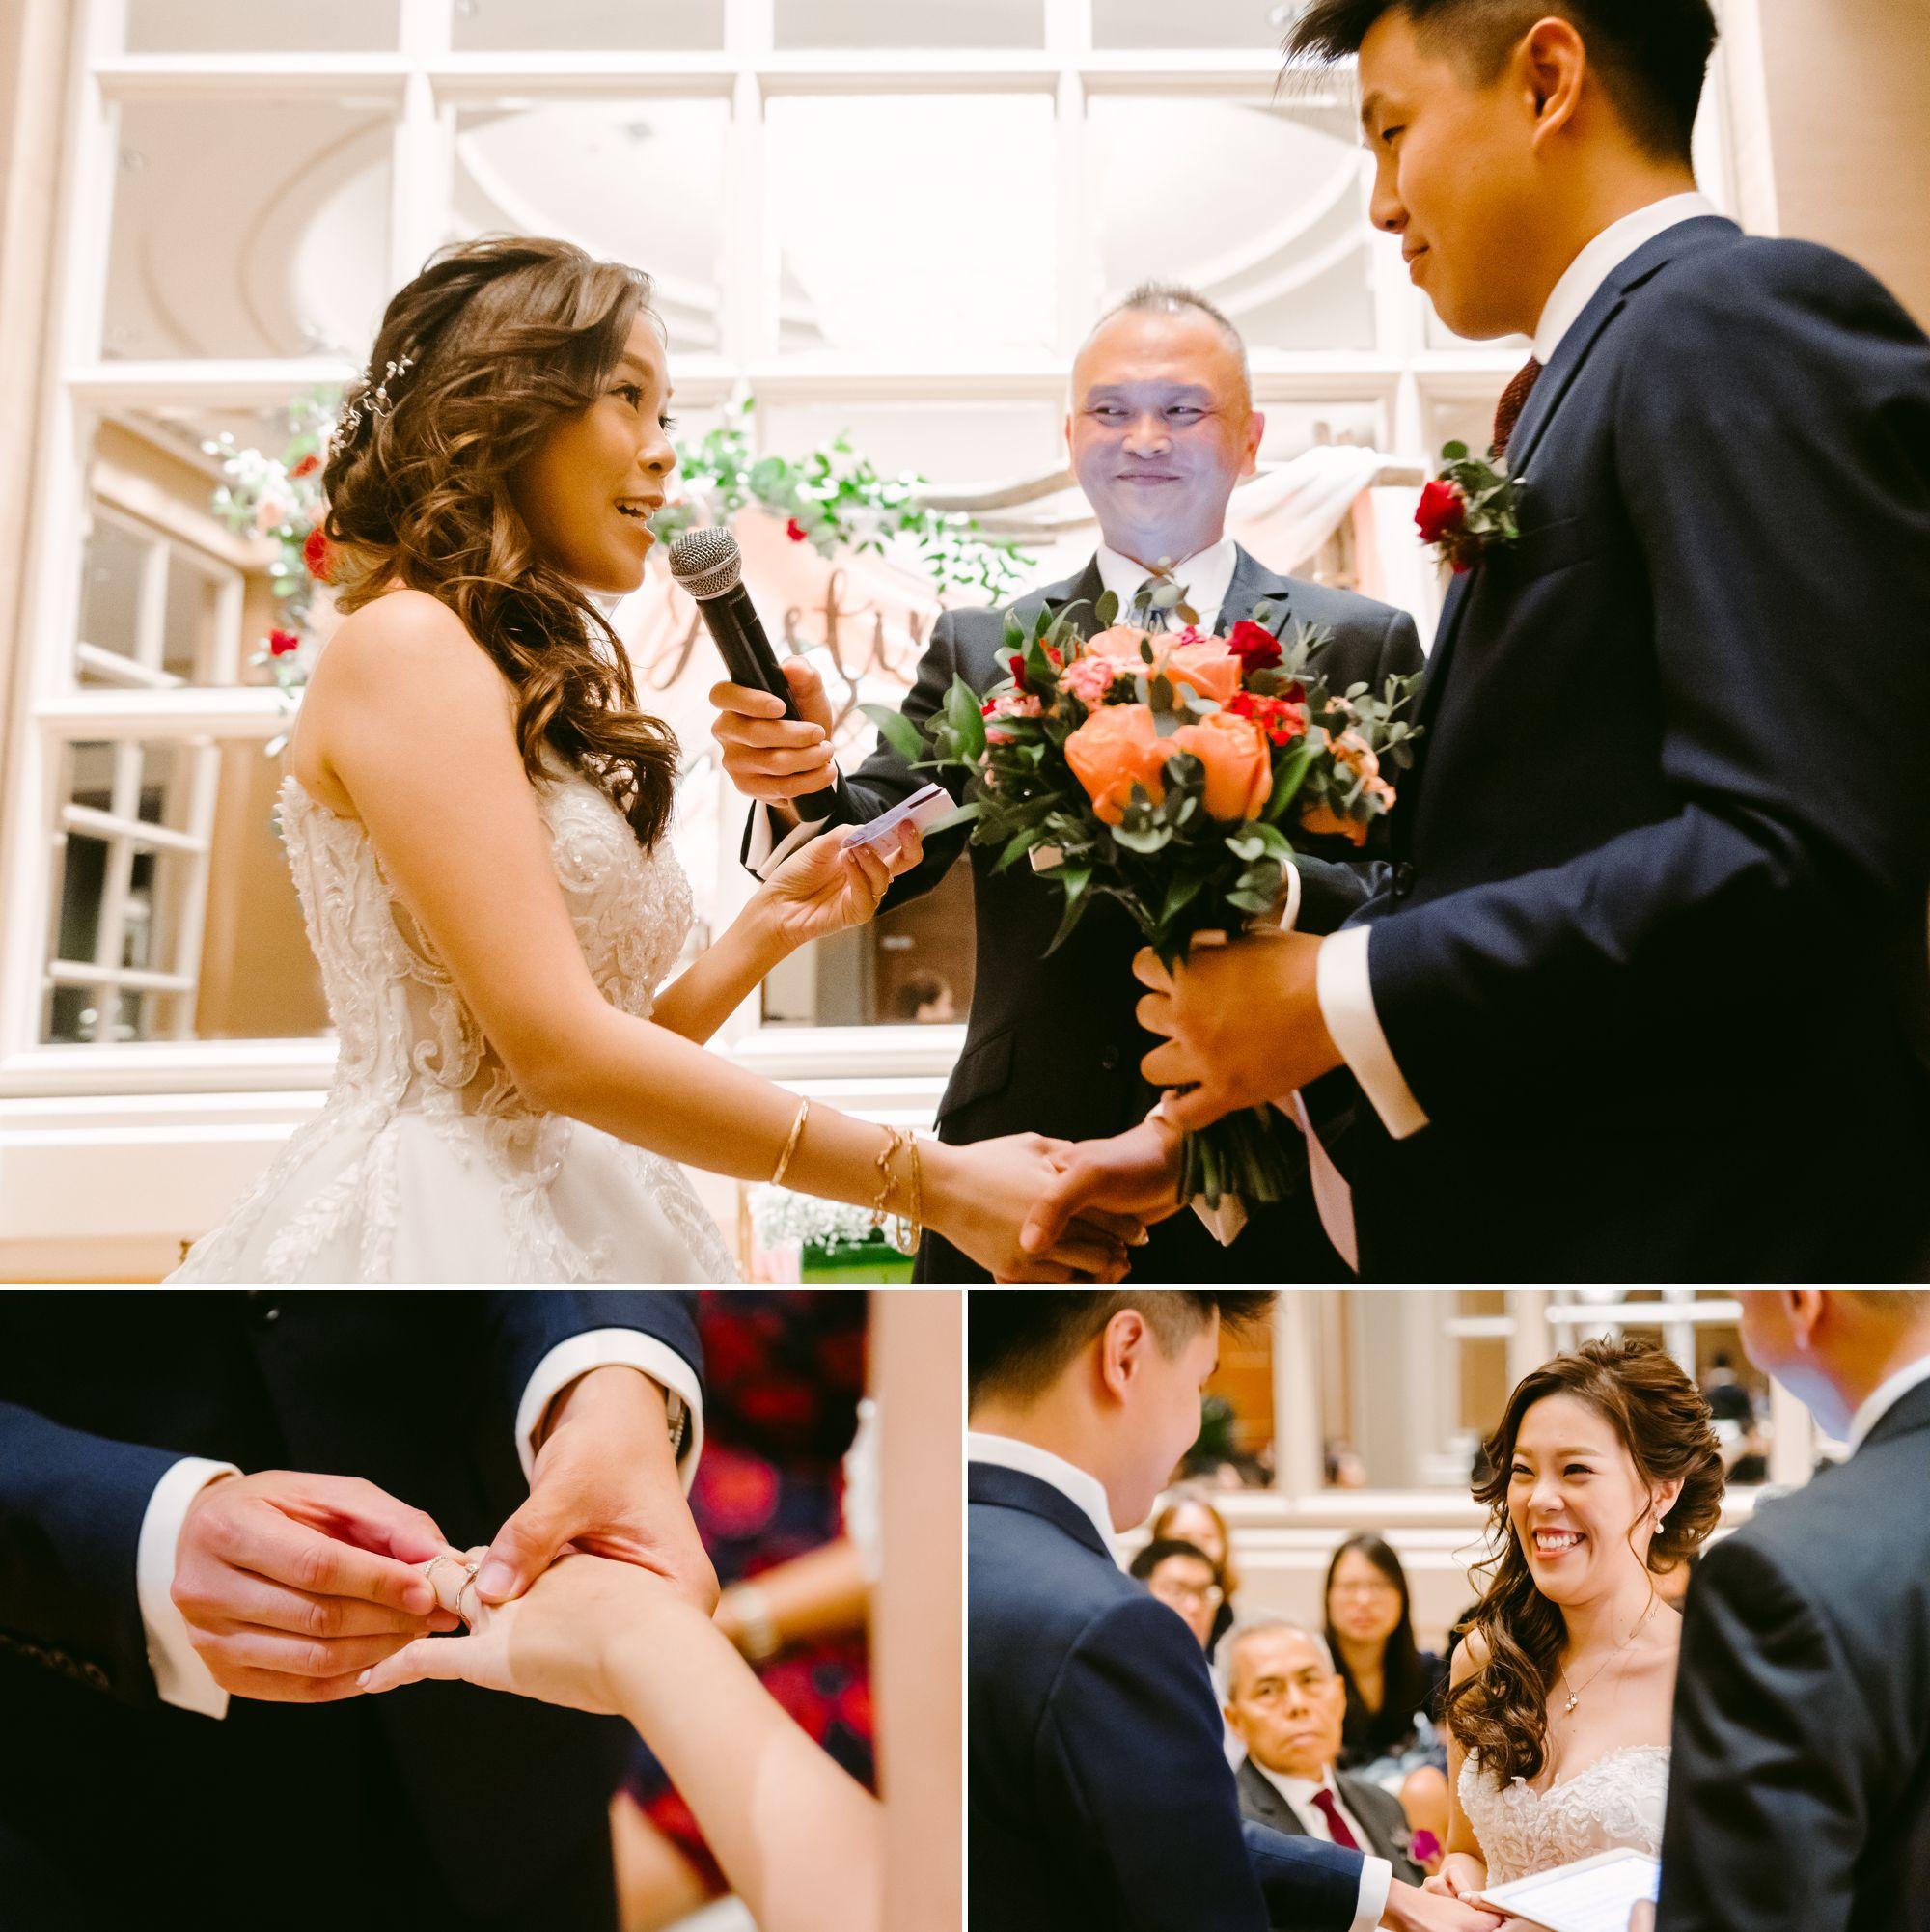 conrad_wedding_Singapore_ 30.jpg